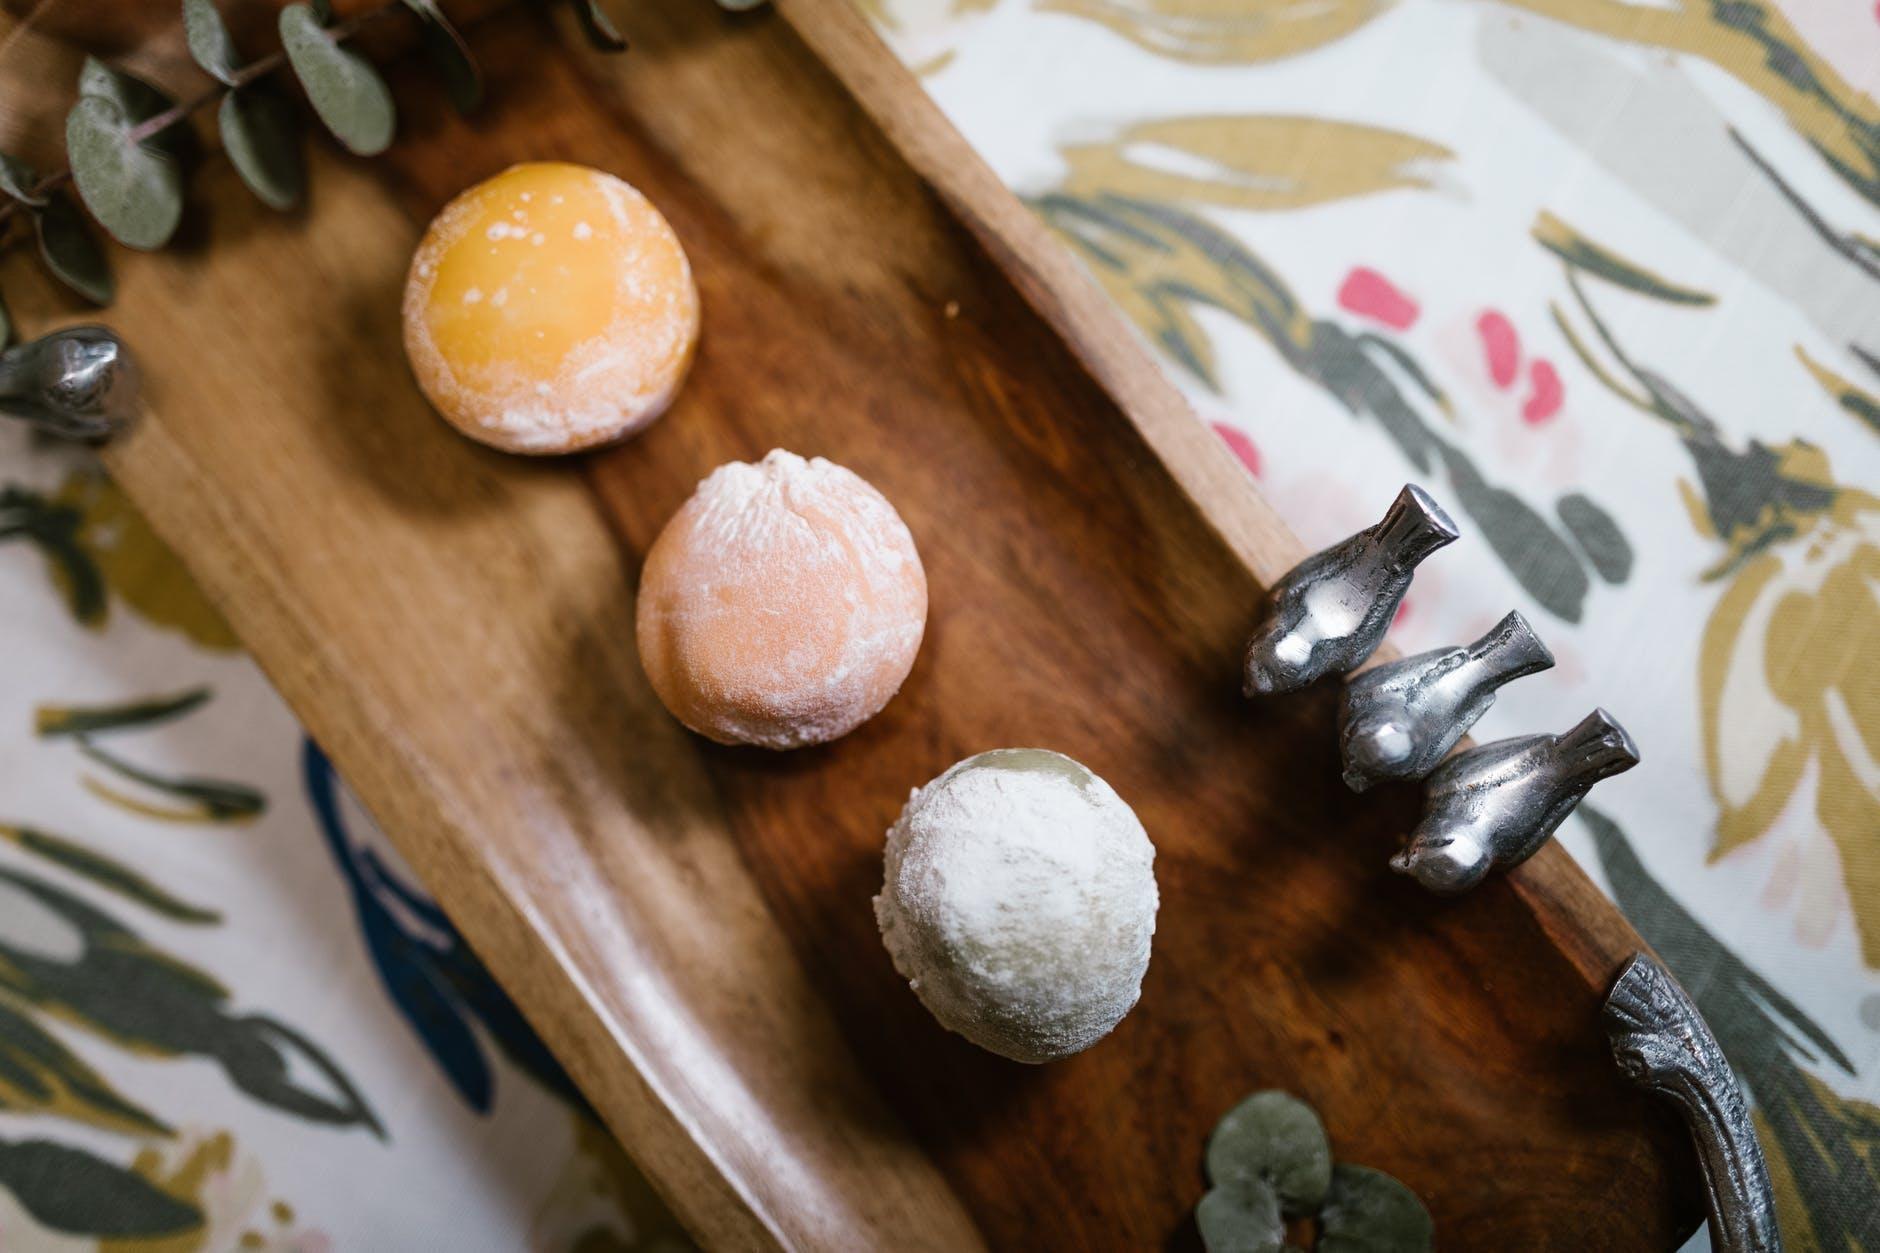 Making mochi from scratch